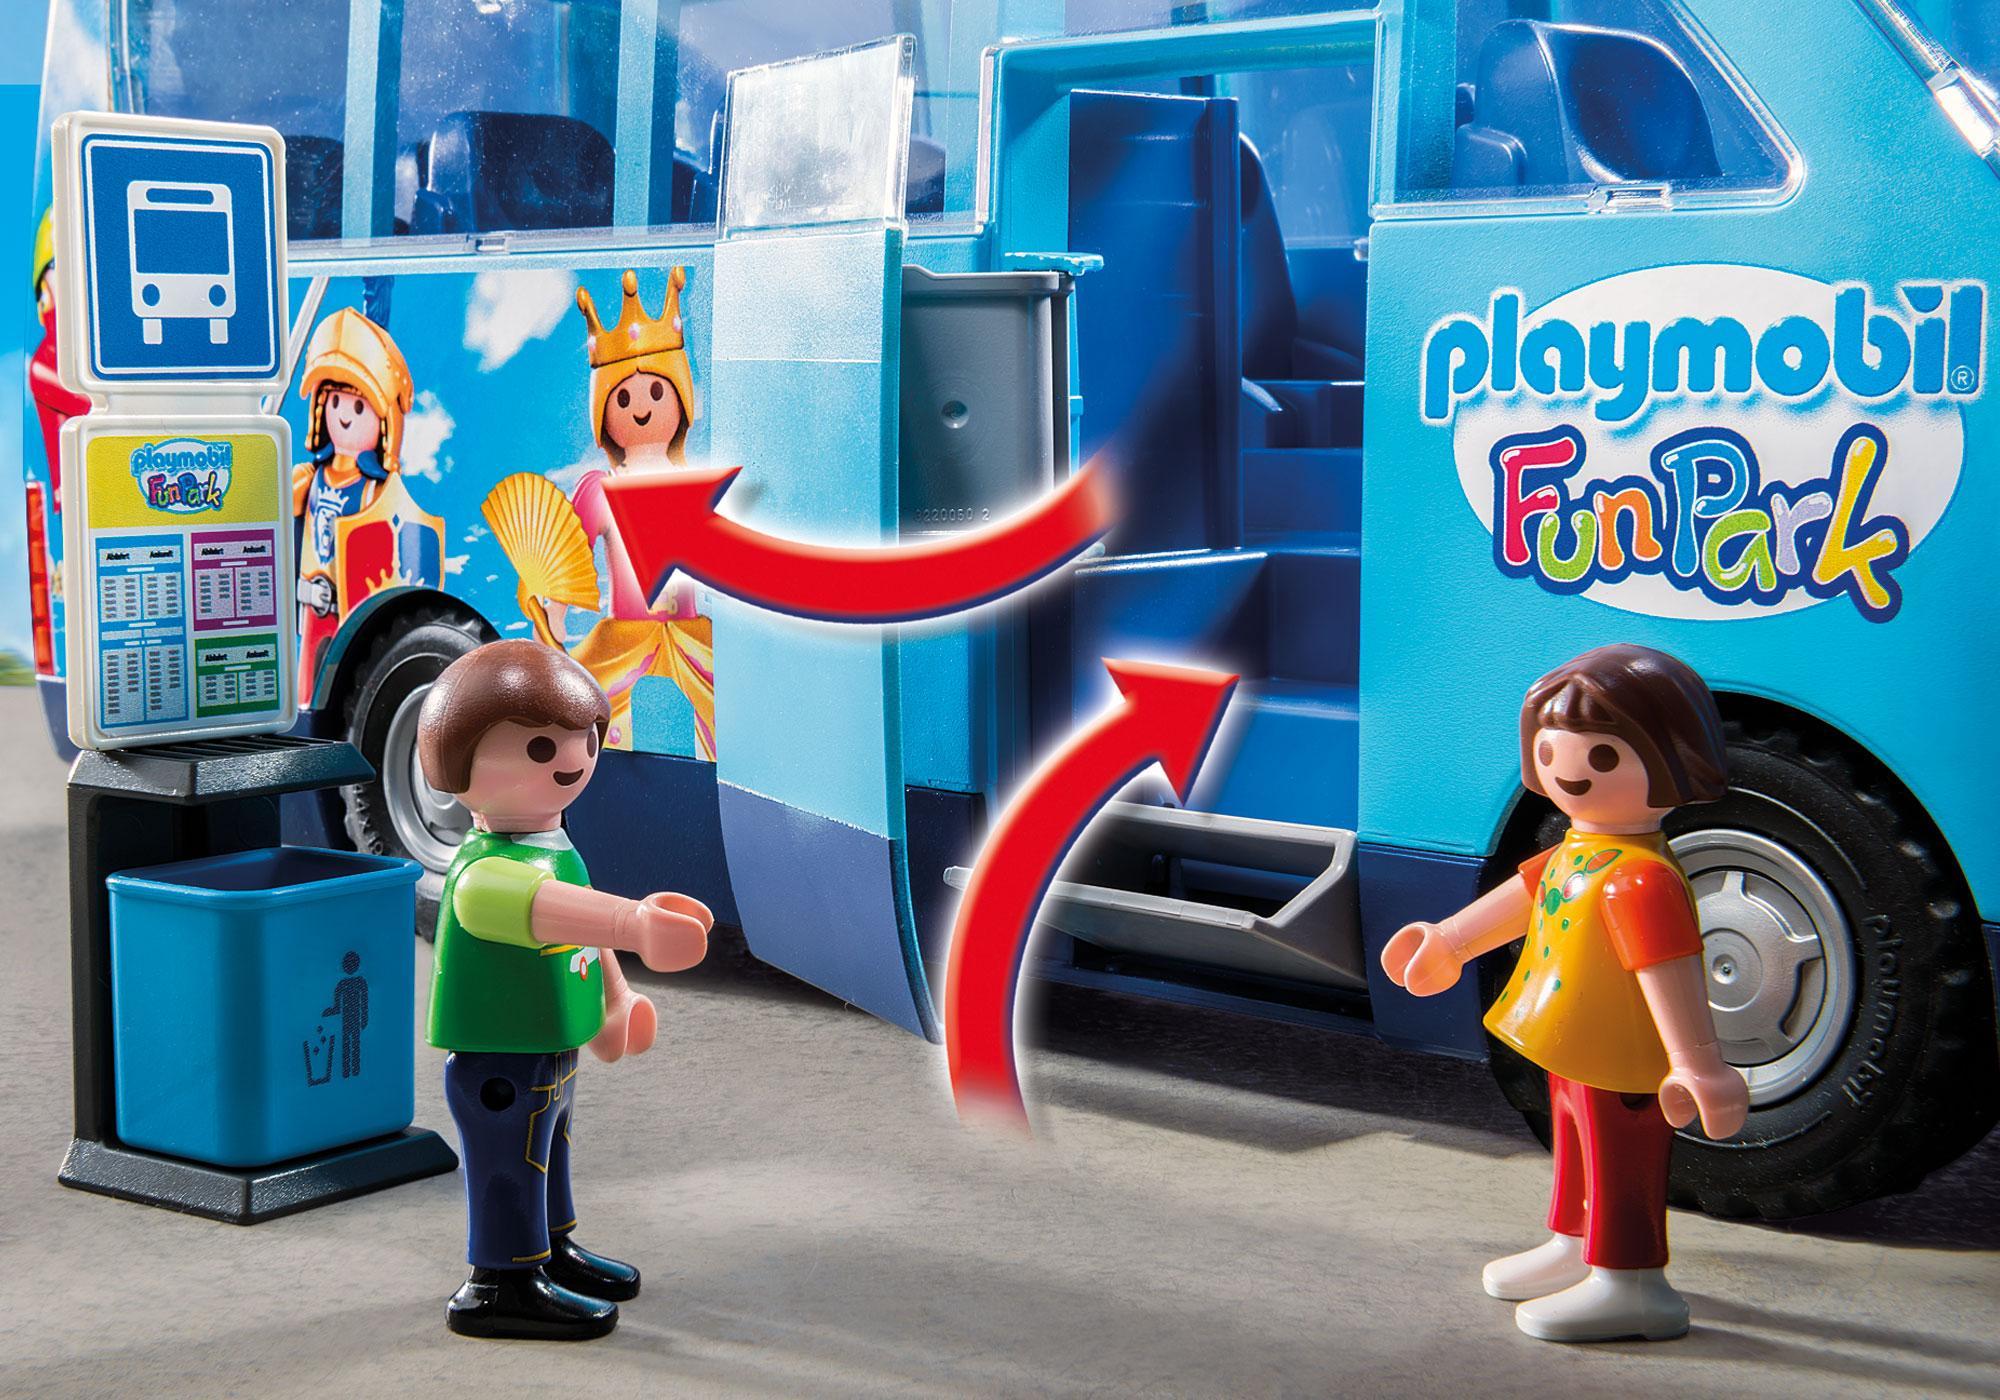 http://media.playmobil.com/i/playmobil/9117_product_extra1/PLAYMOBIL-FunPark Bus